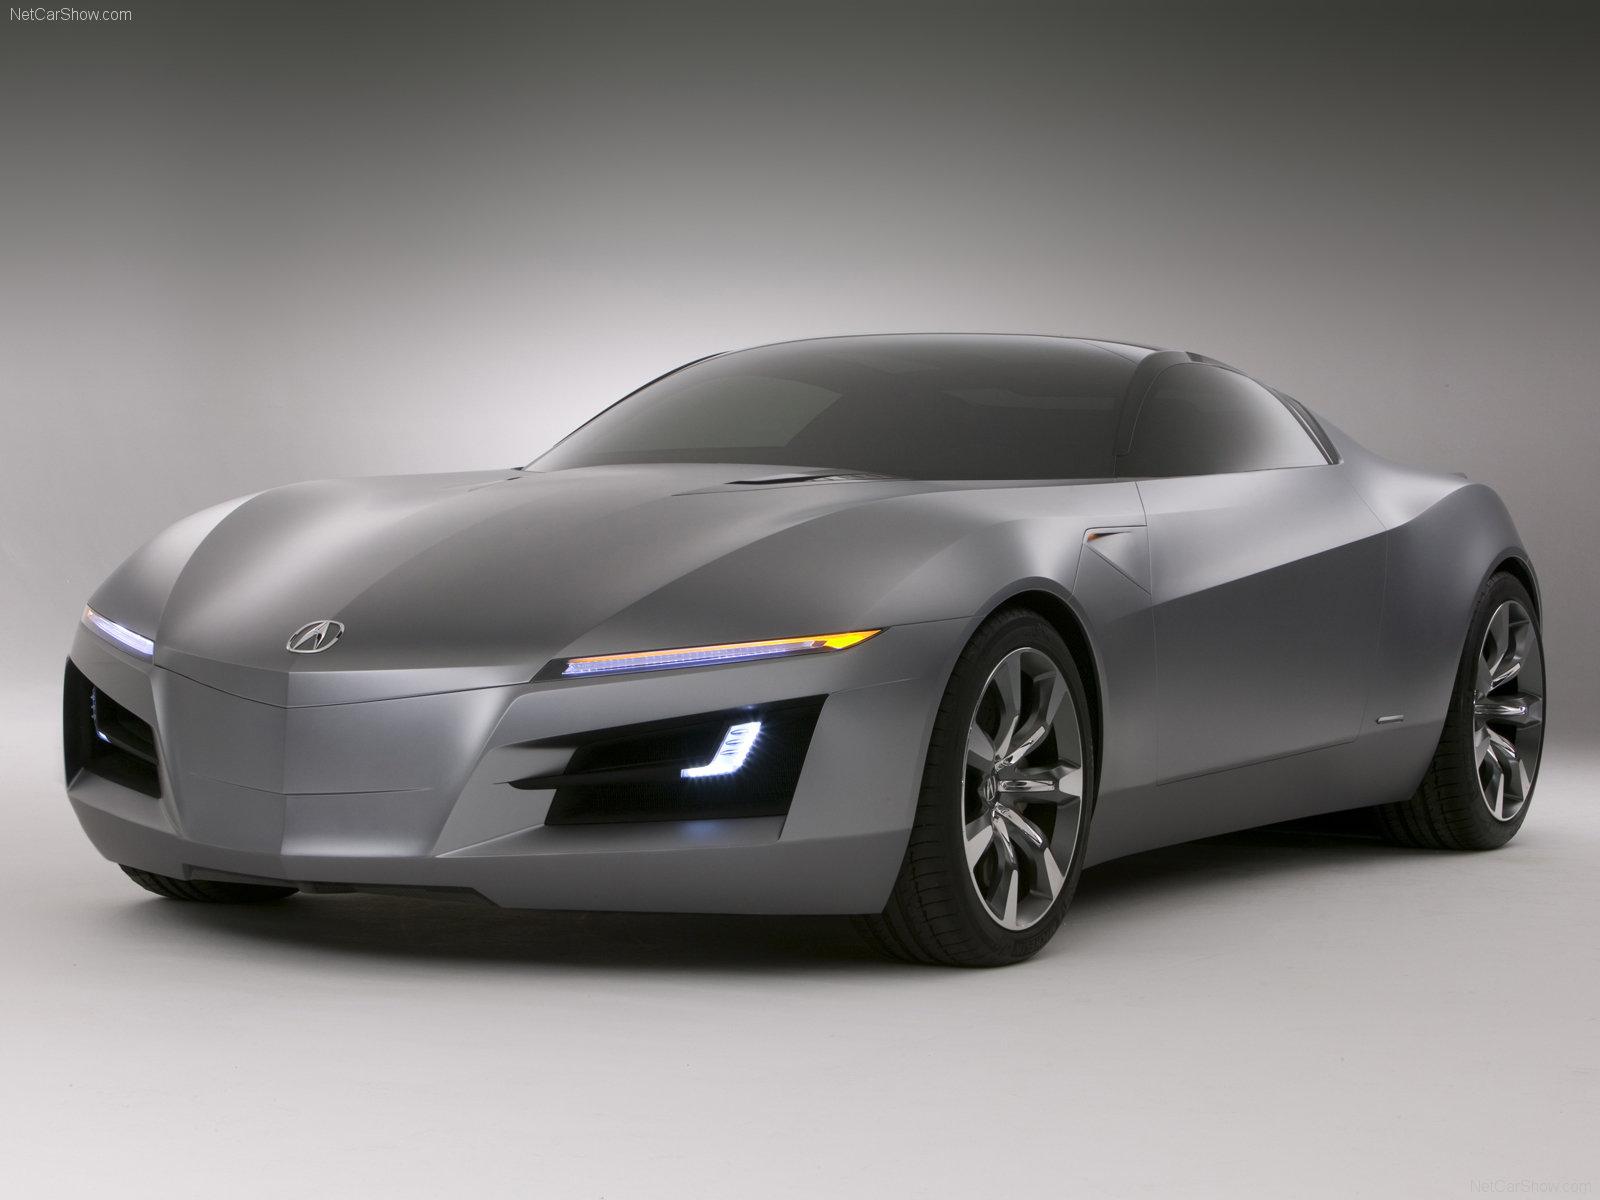 Cars Library: Acura Advanced Sports Car Concept